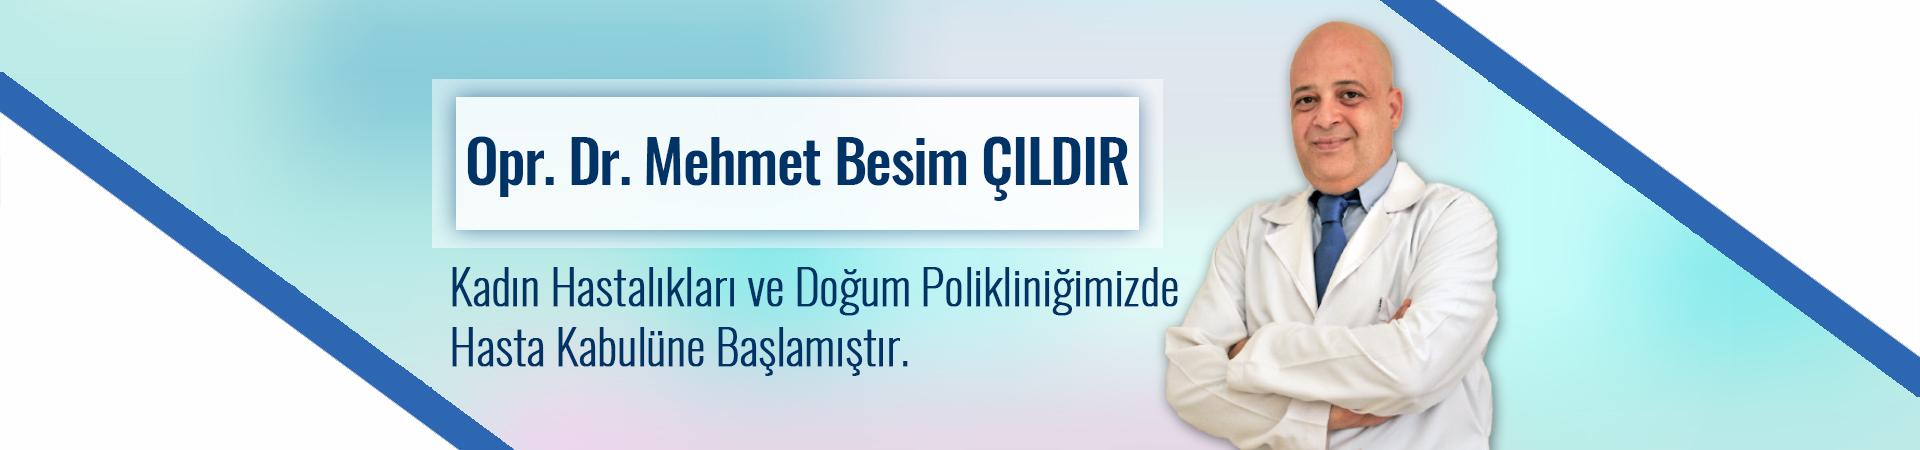 opr-dr-besim-cildir-city-slider